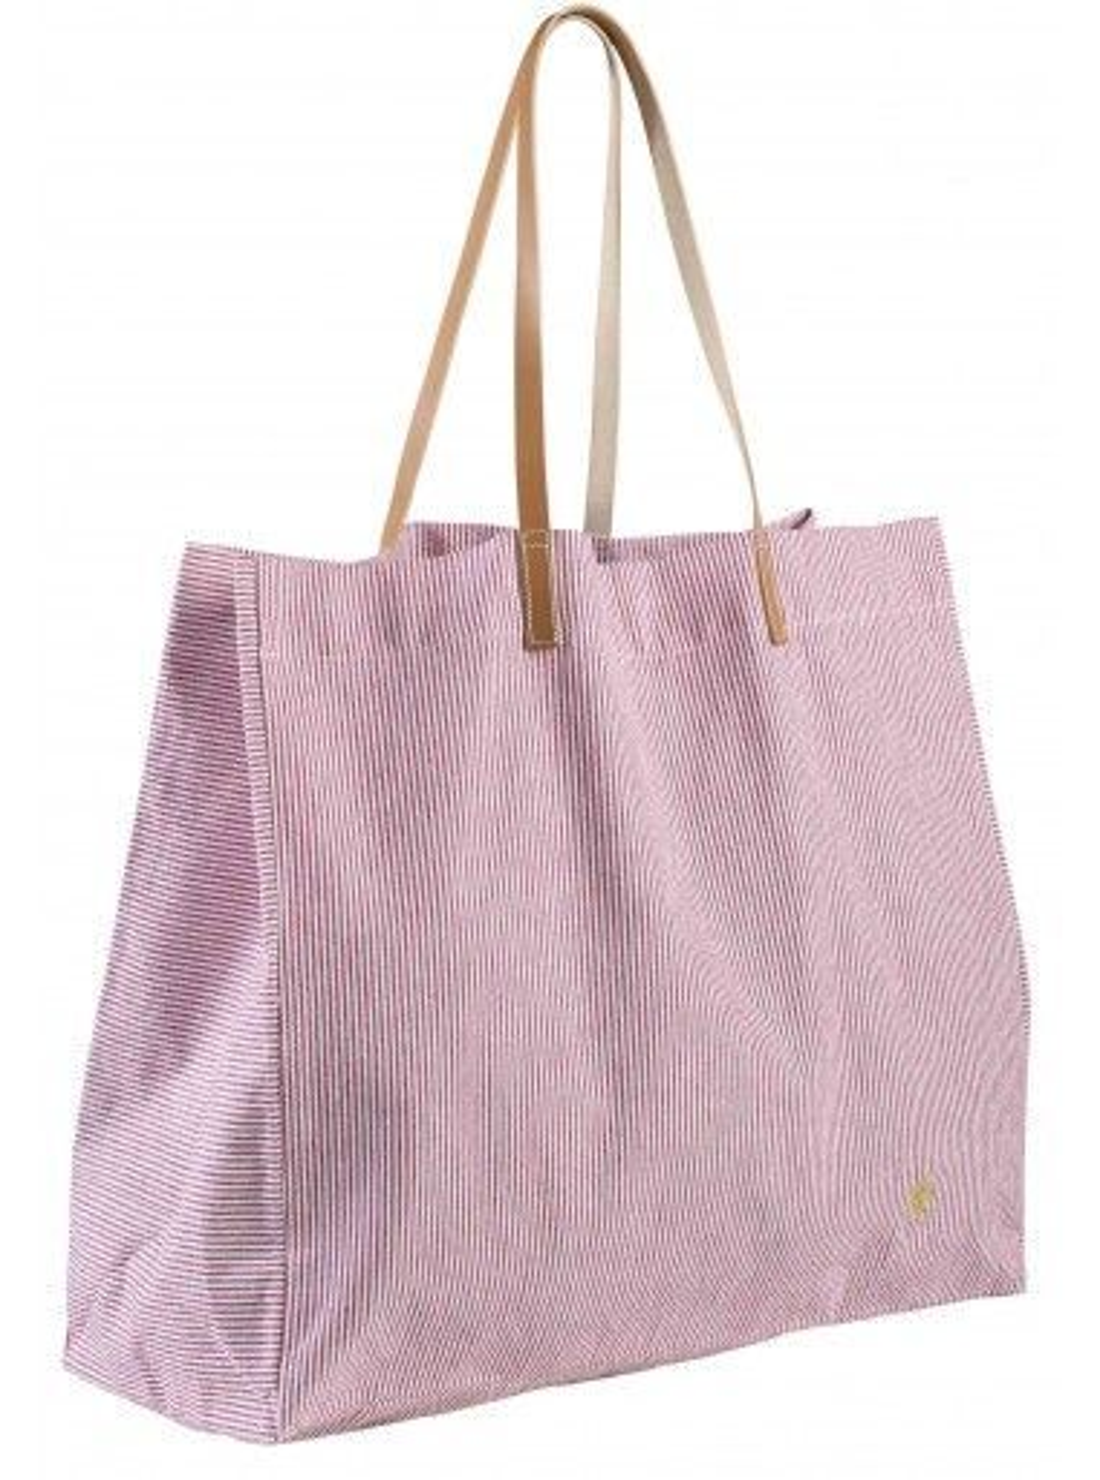 Photo for Shopping Bag Finette Tomato